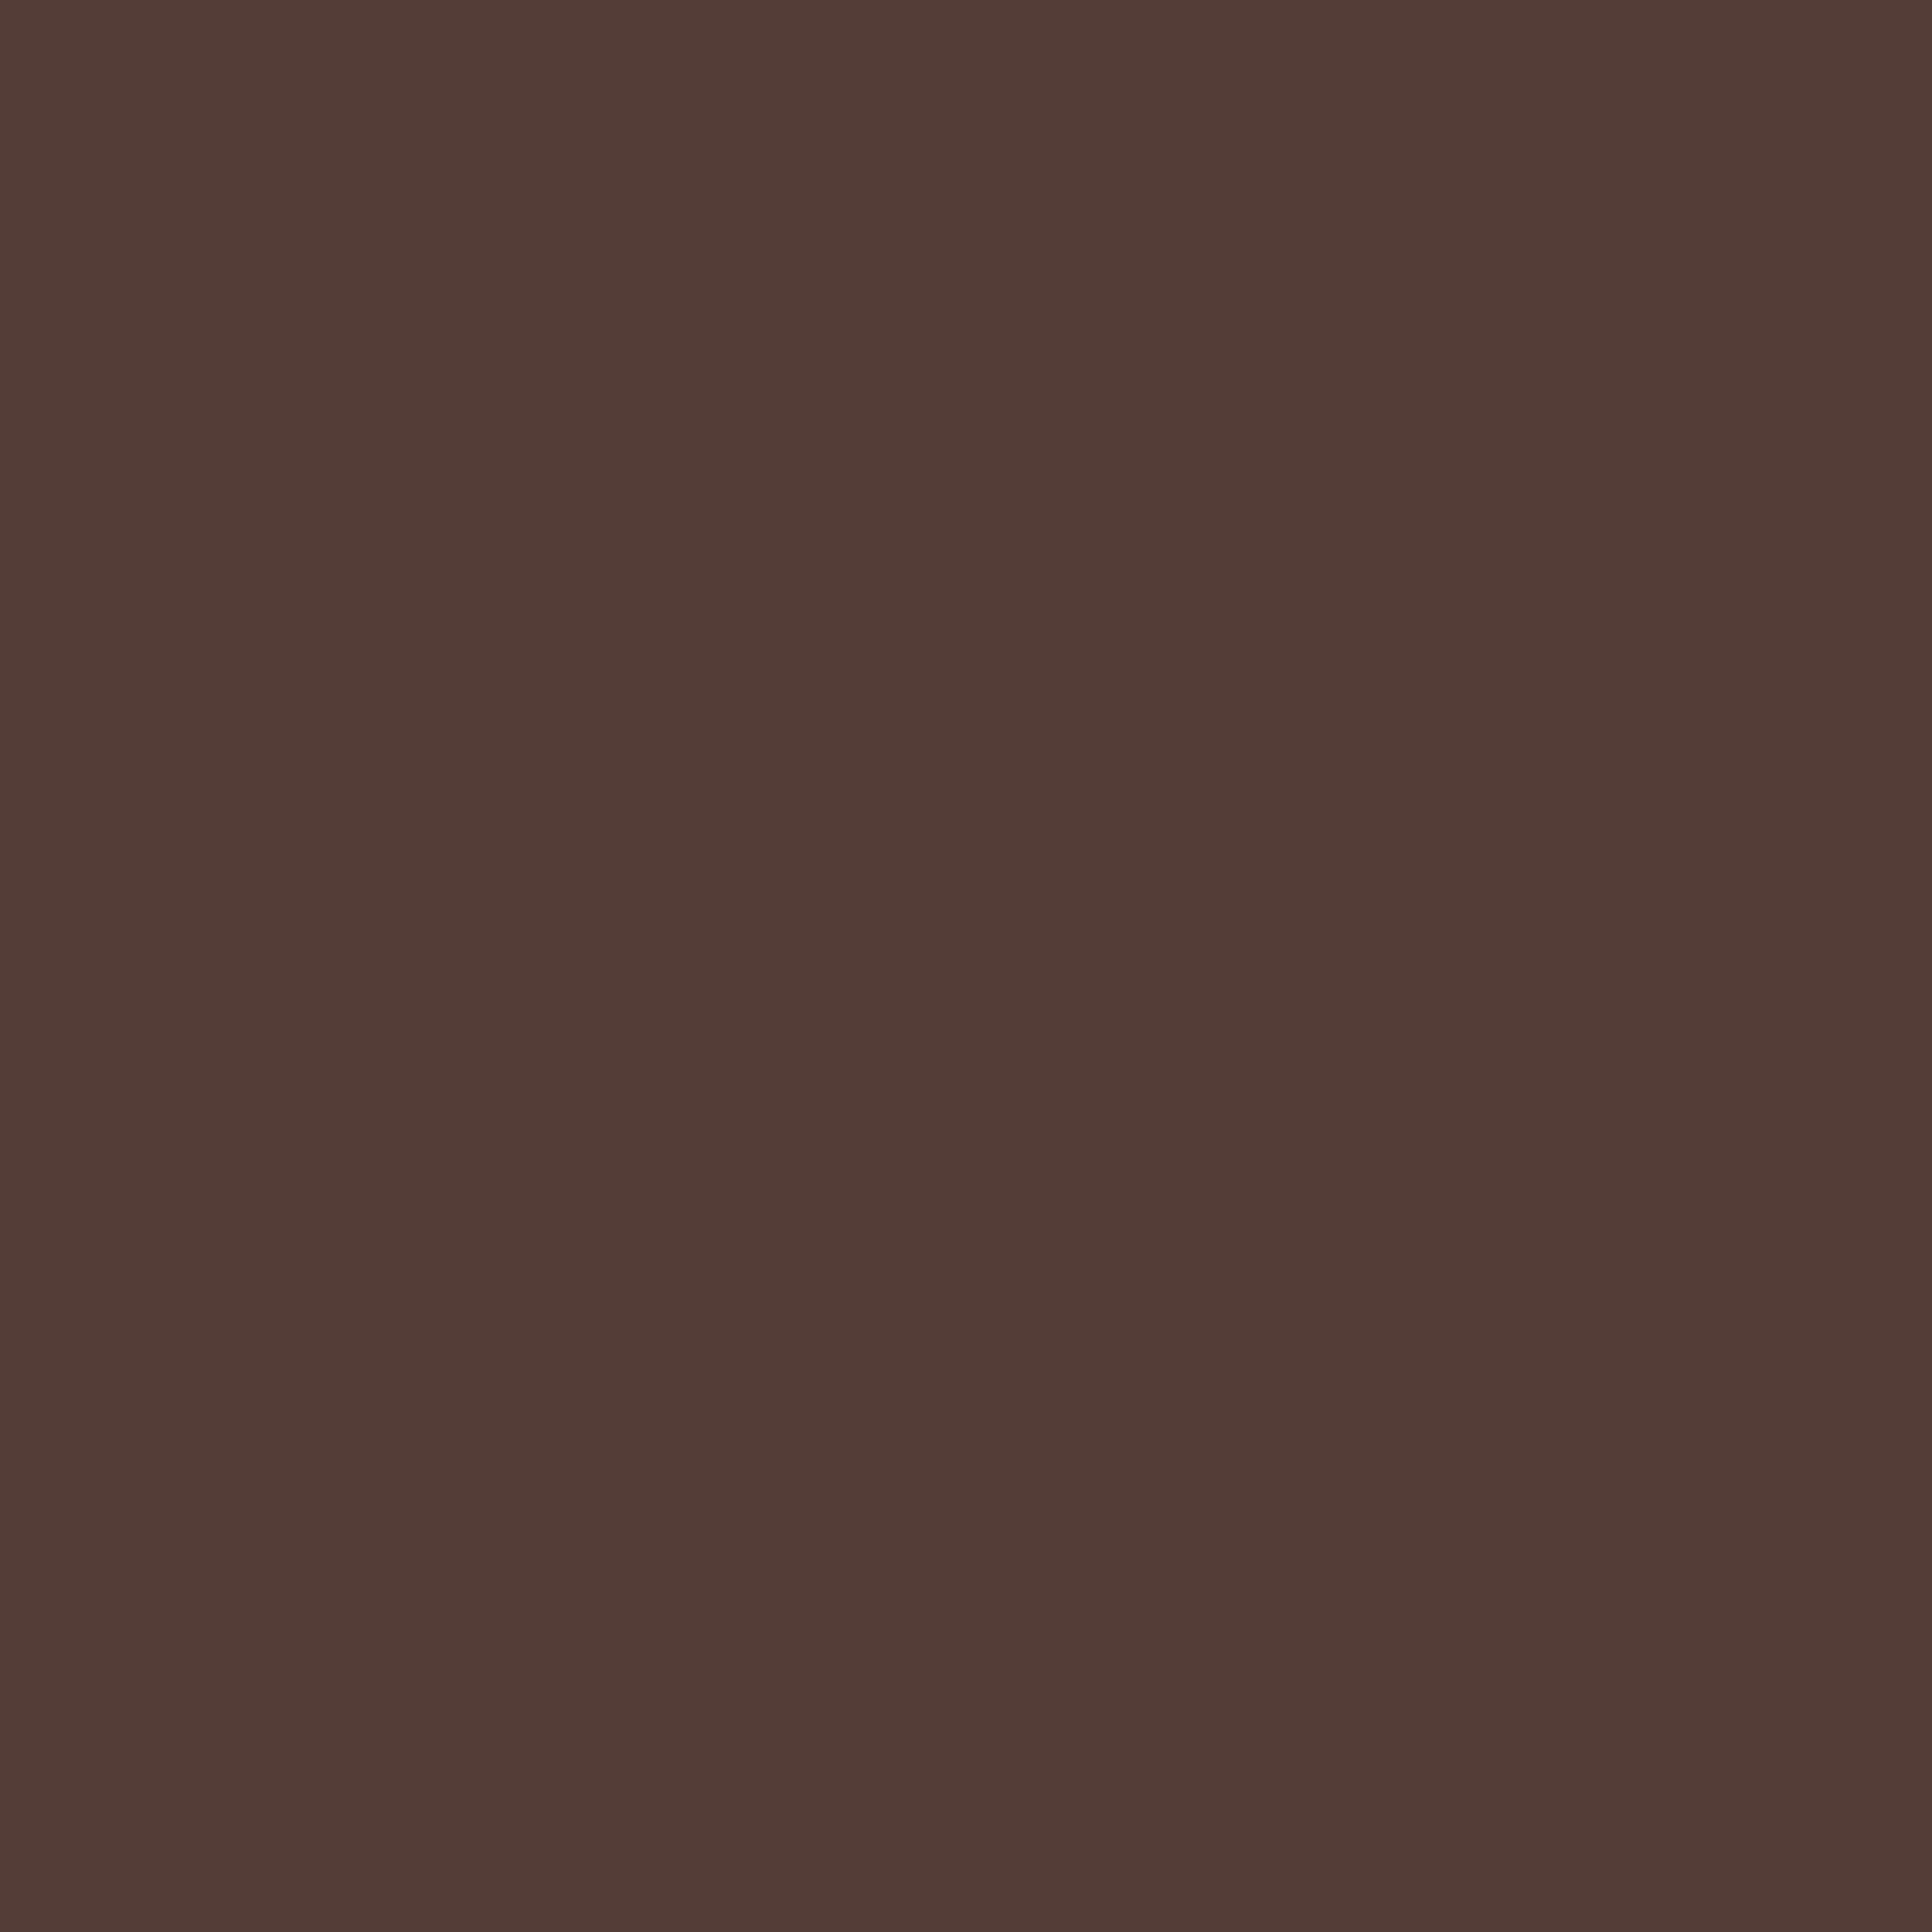 2048x2048 Dark Liver Horses Solid Color Background